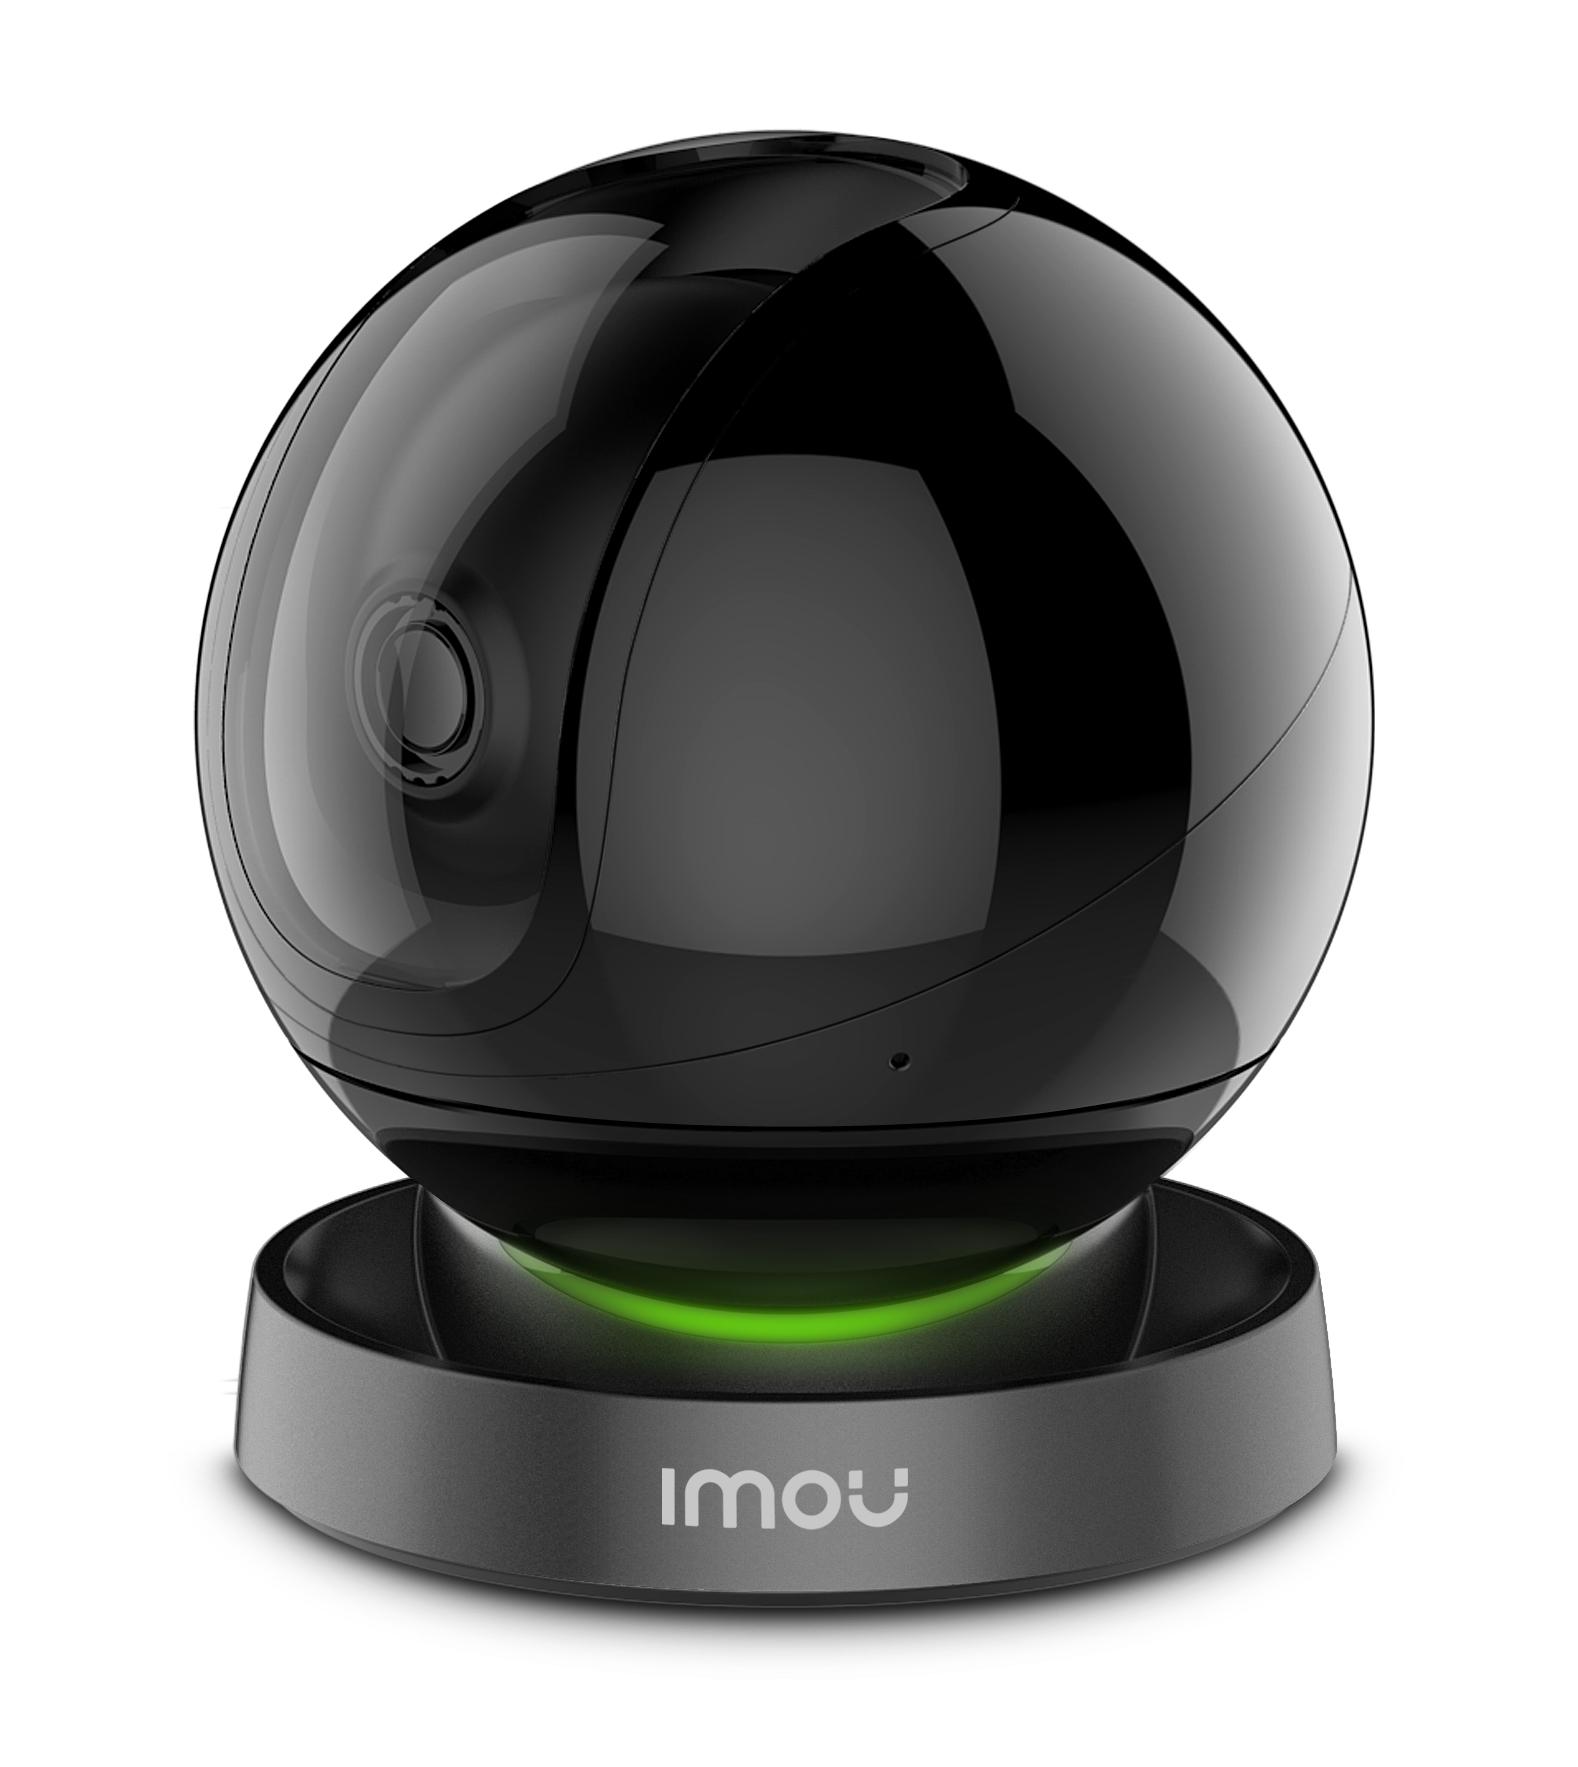 Kamera Full Hd Wi-Fi z funkcją obrotu Imou Ranger